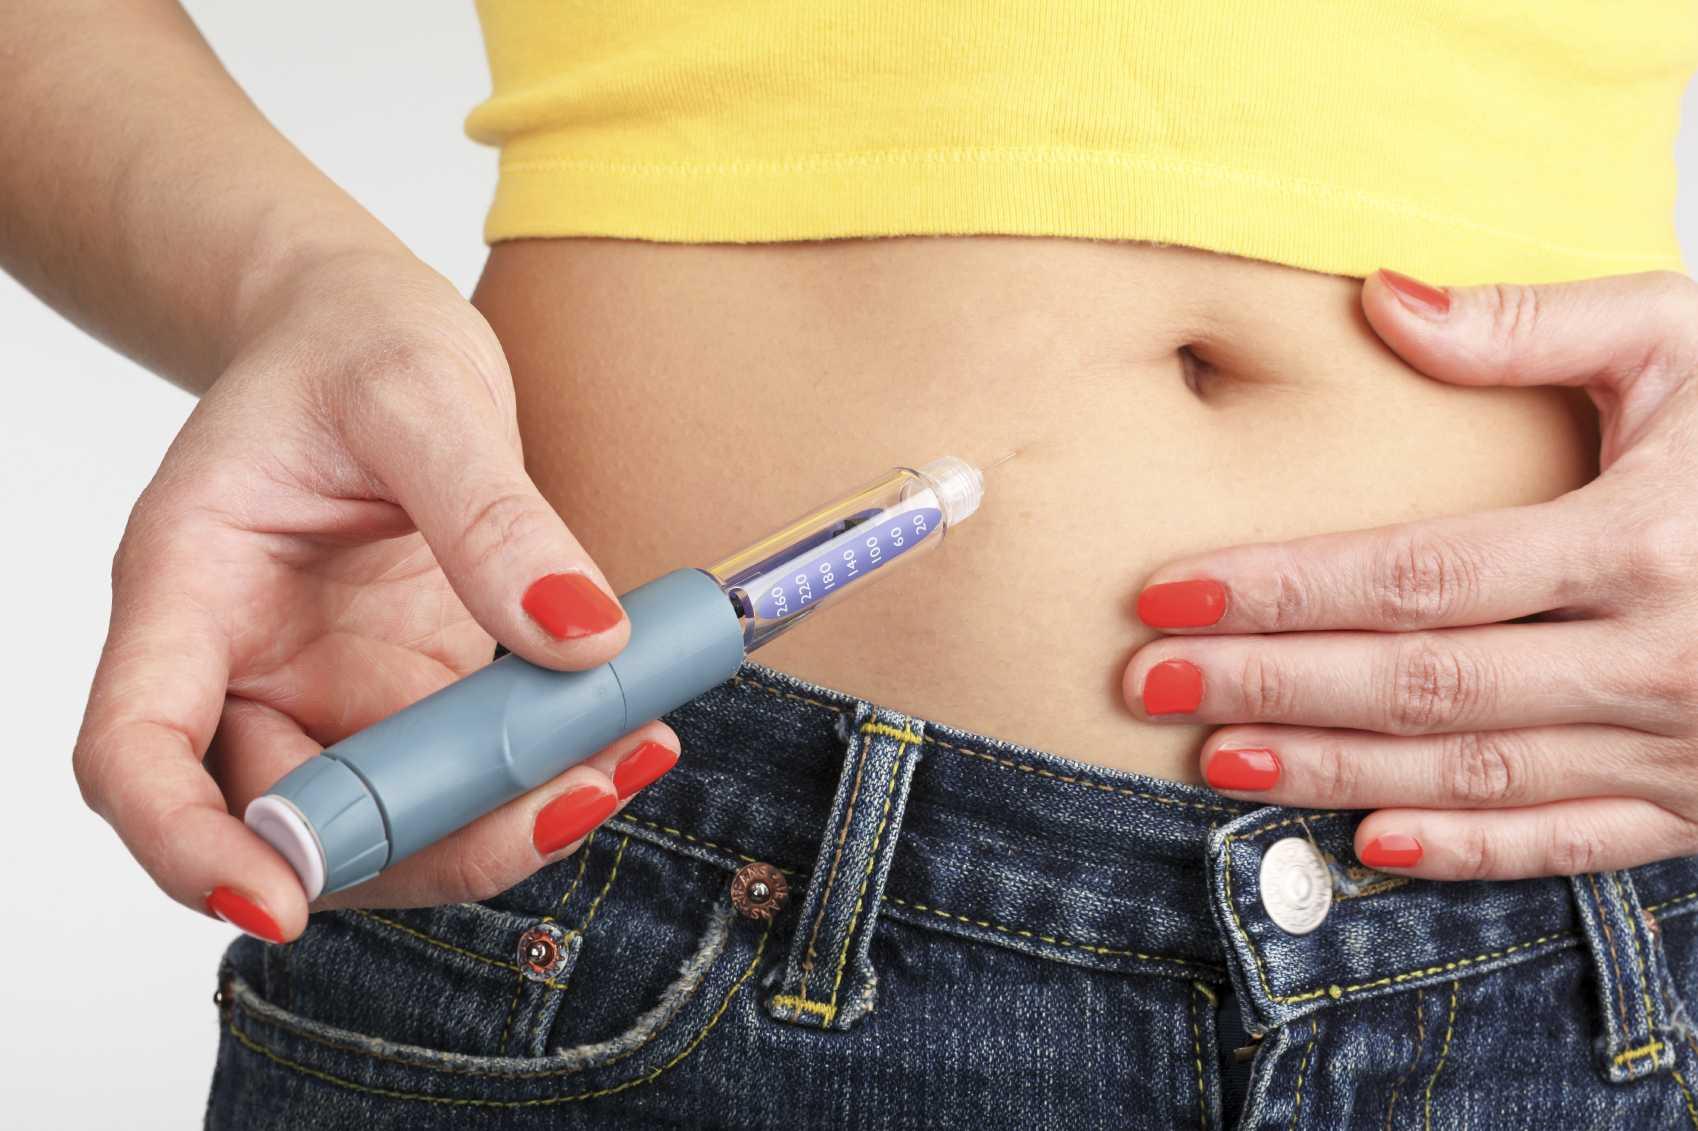 Injecting Insulin